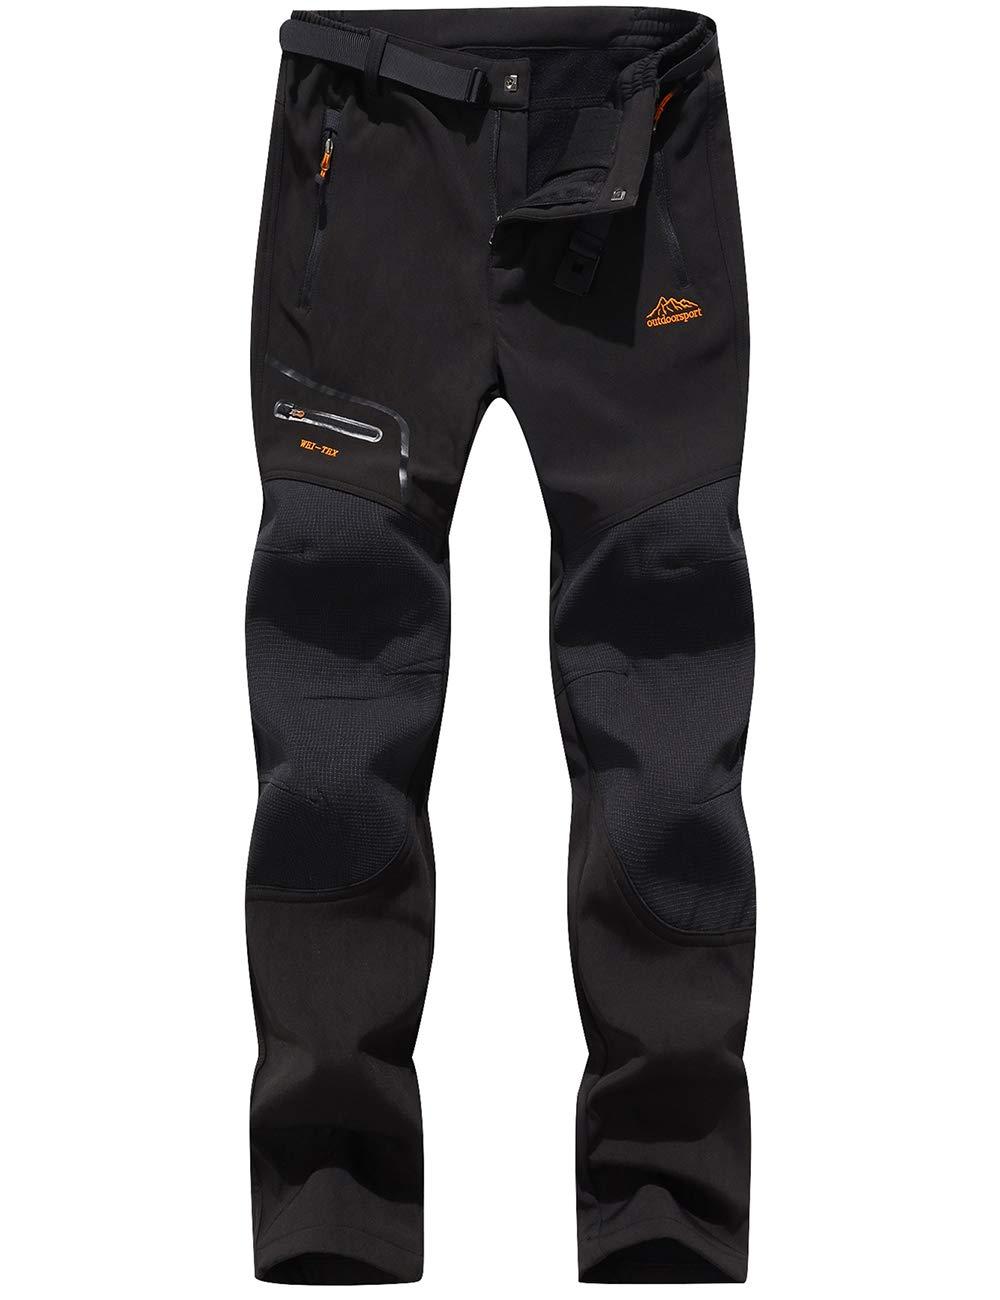 BenBoy Women's Outdoor Waterproof Windproof Fleece Cargo Snow Ski Hiking Pants,SF1602W Black XS by BenBoy